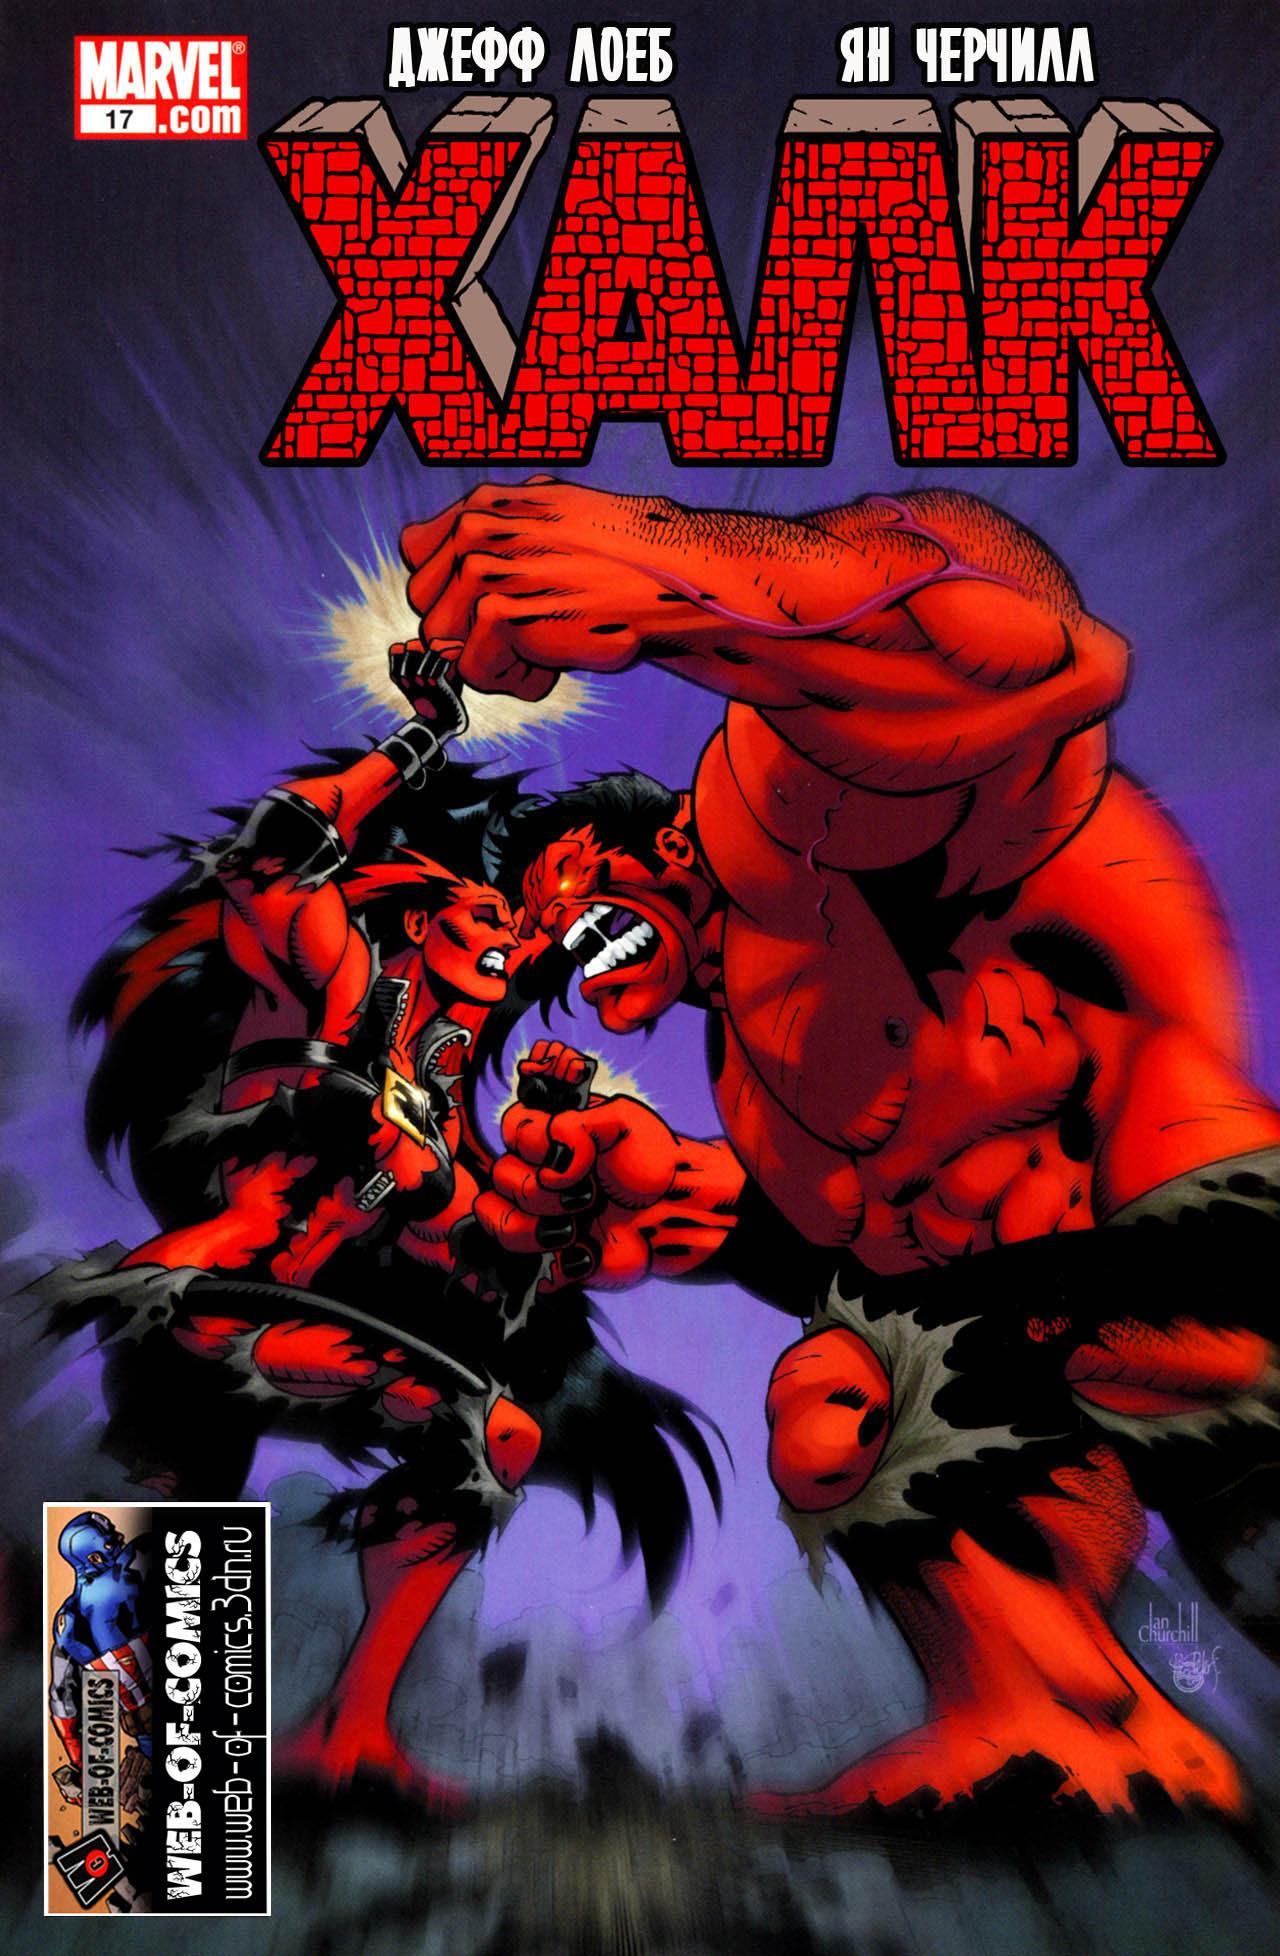 Hulk and red she hulk